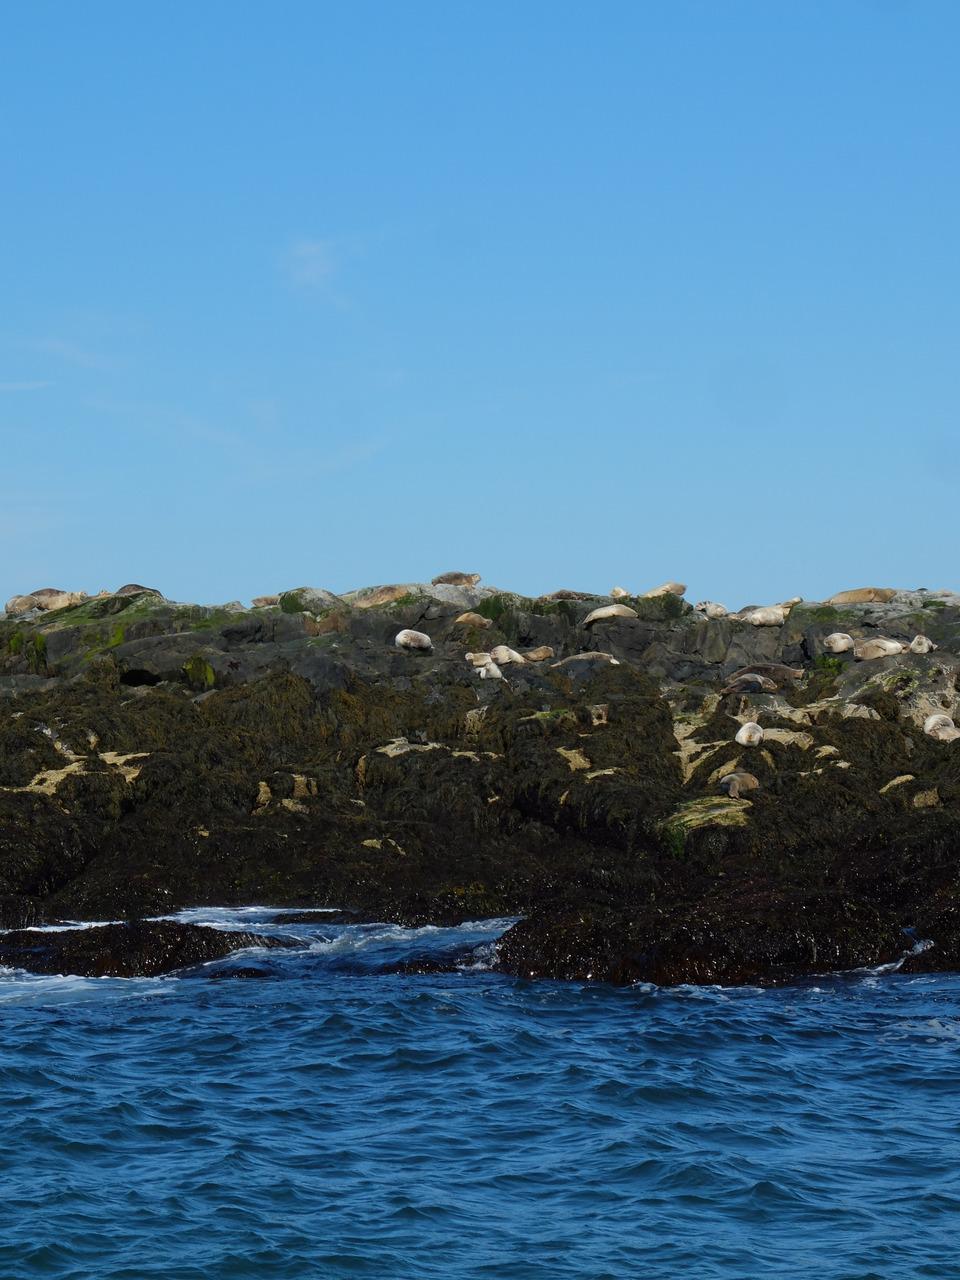 mangia minga // Travels: Grand Manan, New Brunswick. North Rock near Machias Seal Island